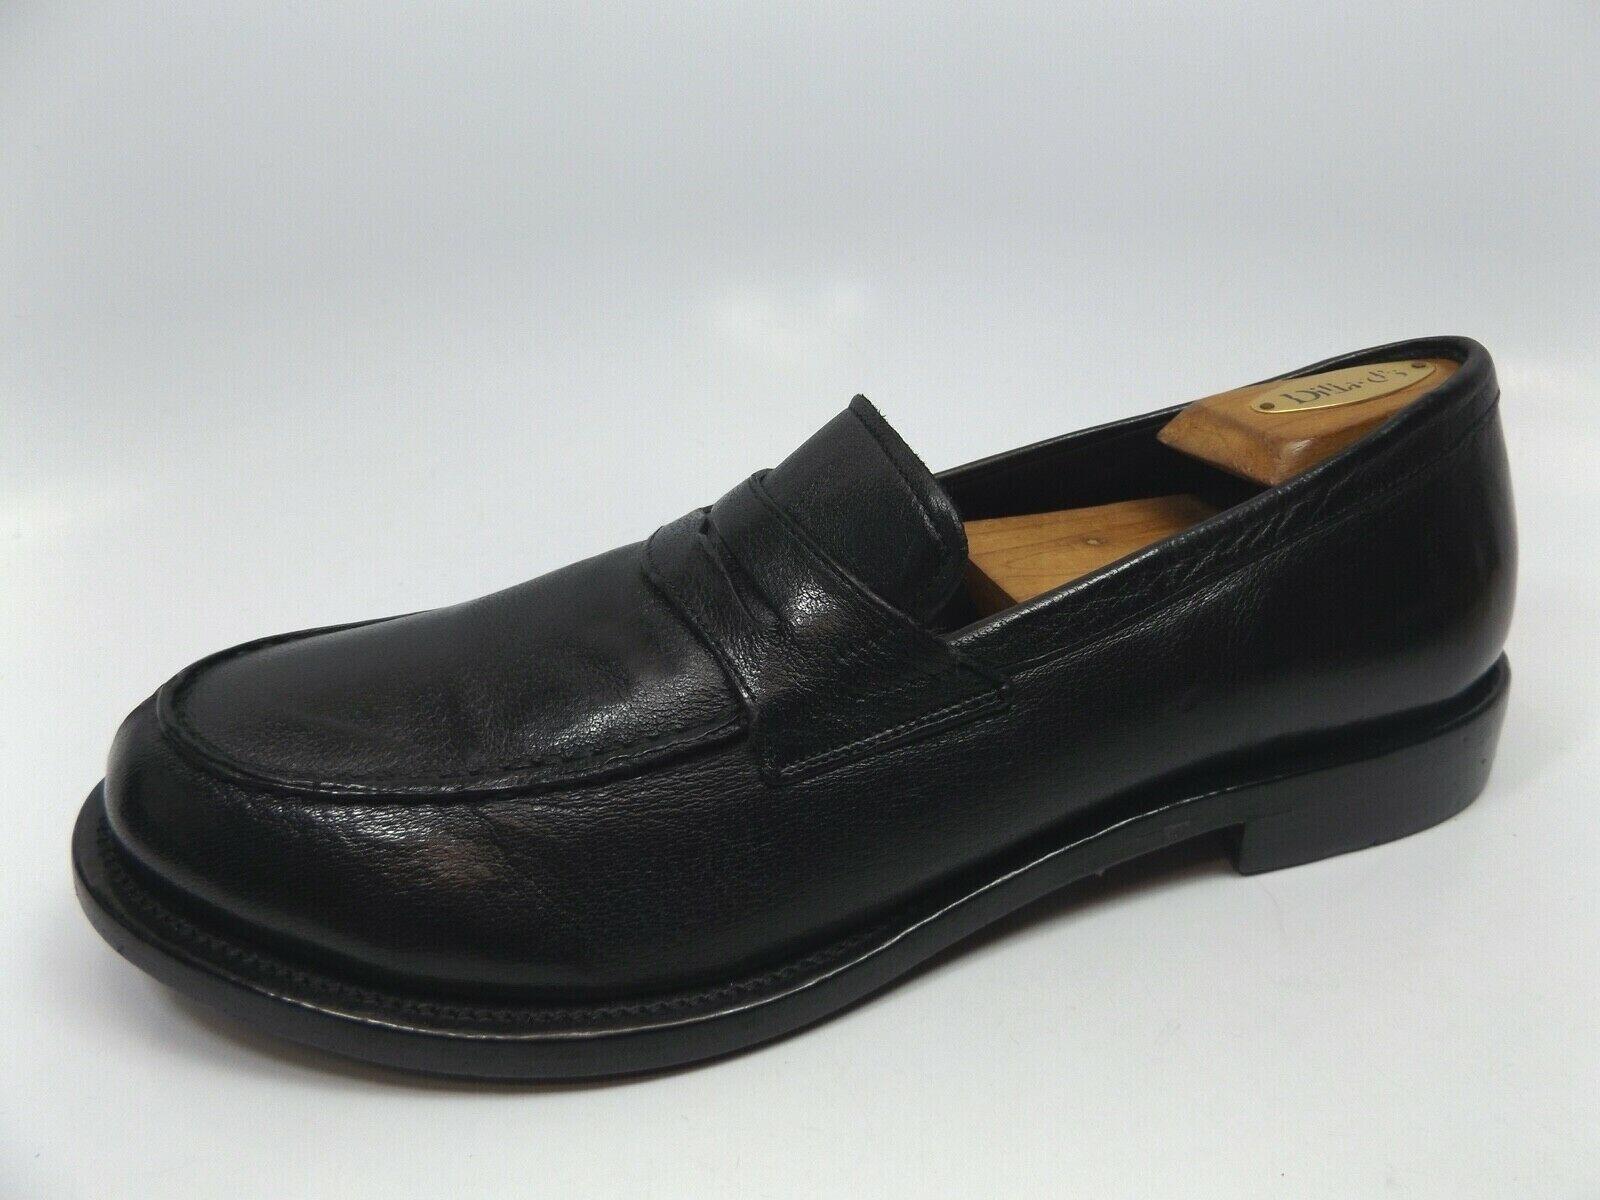 Neu Herren Frye Murry Pennyloafer Schwarz Leder Italien Schuhe, Sz 10.5 M,